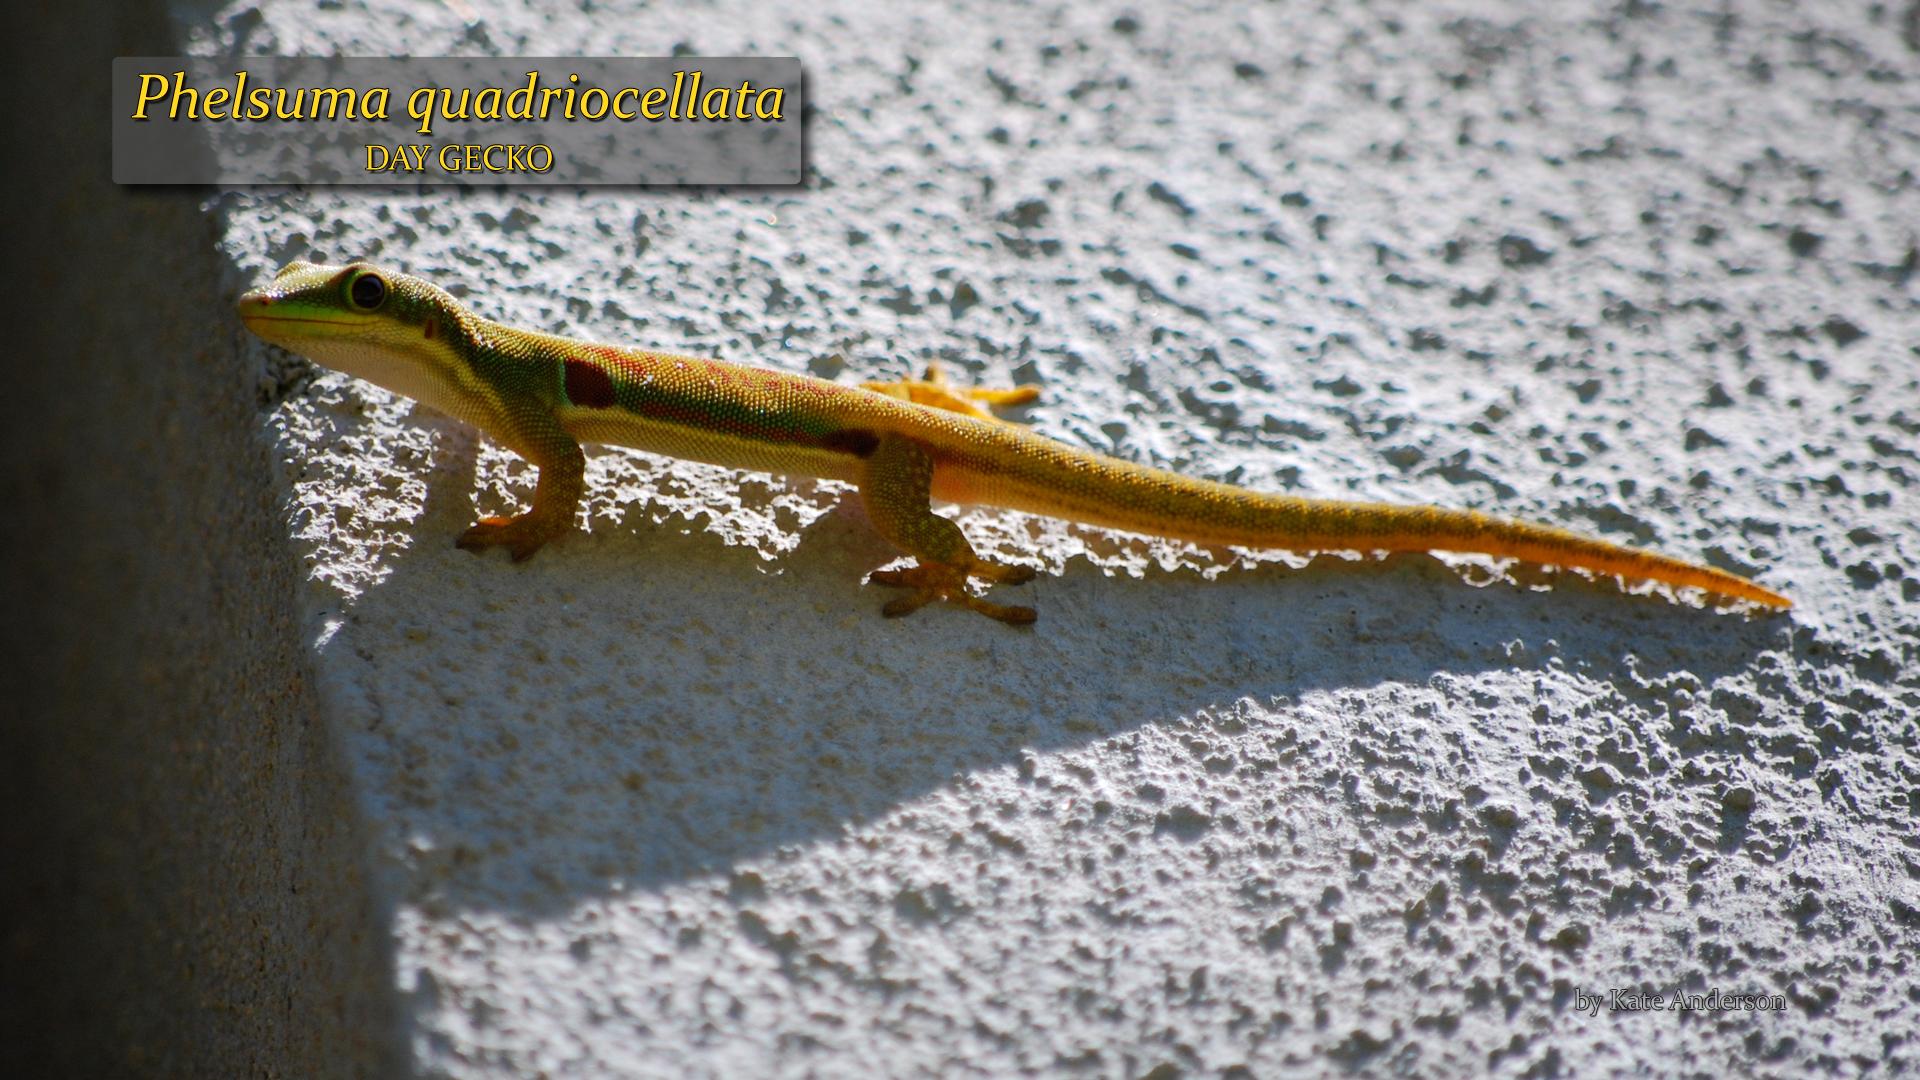 Phelsuma quadriocellata- Kate Anderson.jpg